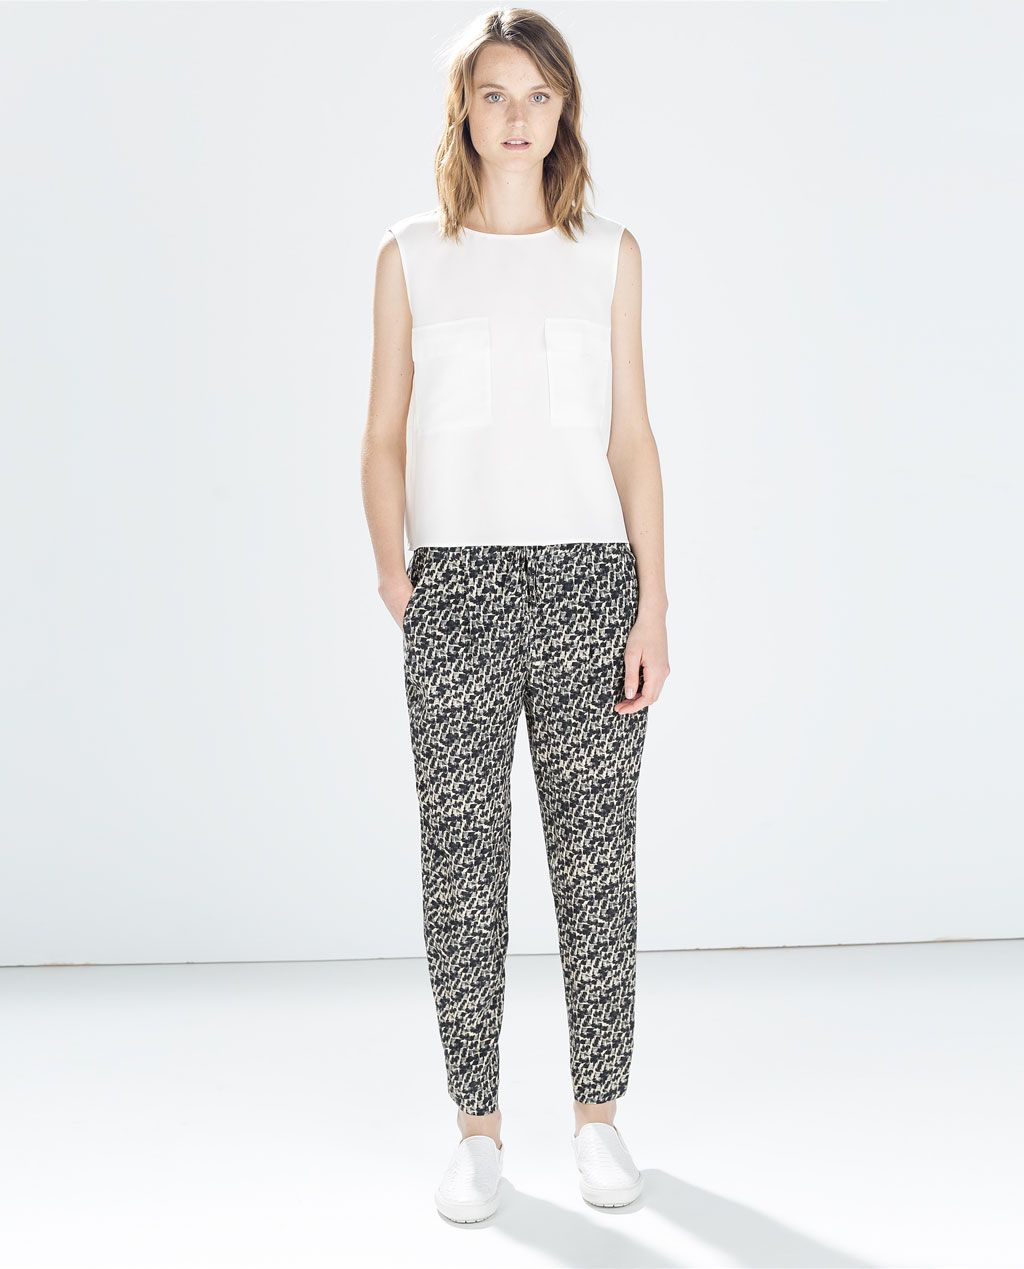 Zara Pantalón Fluido Pijamero Mujer Señorial Estampado rvq1rHa